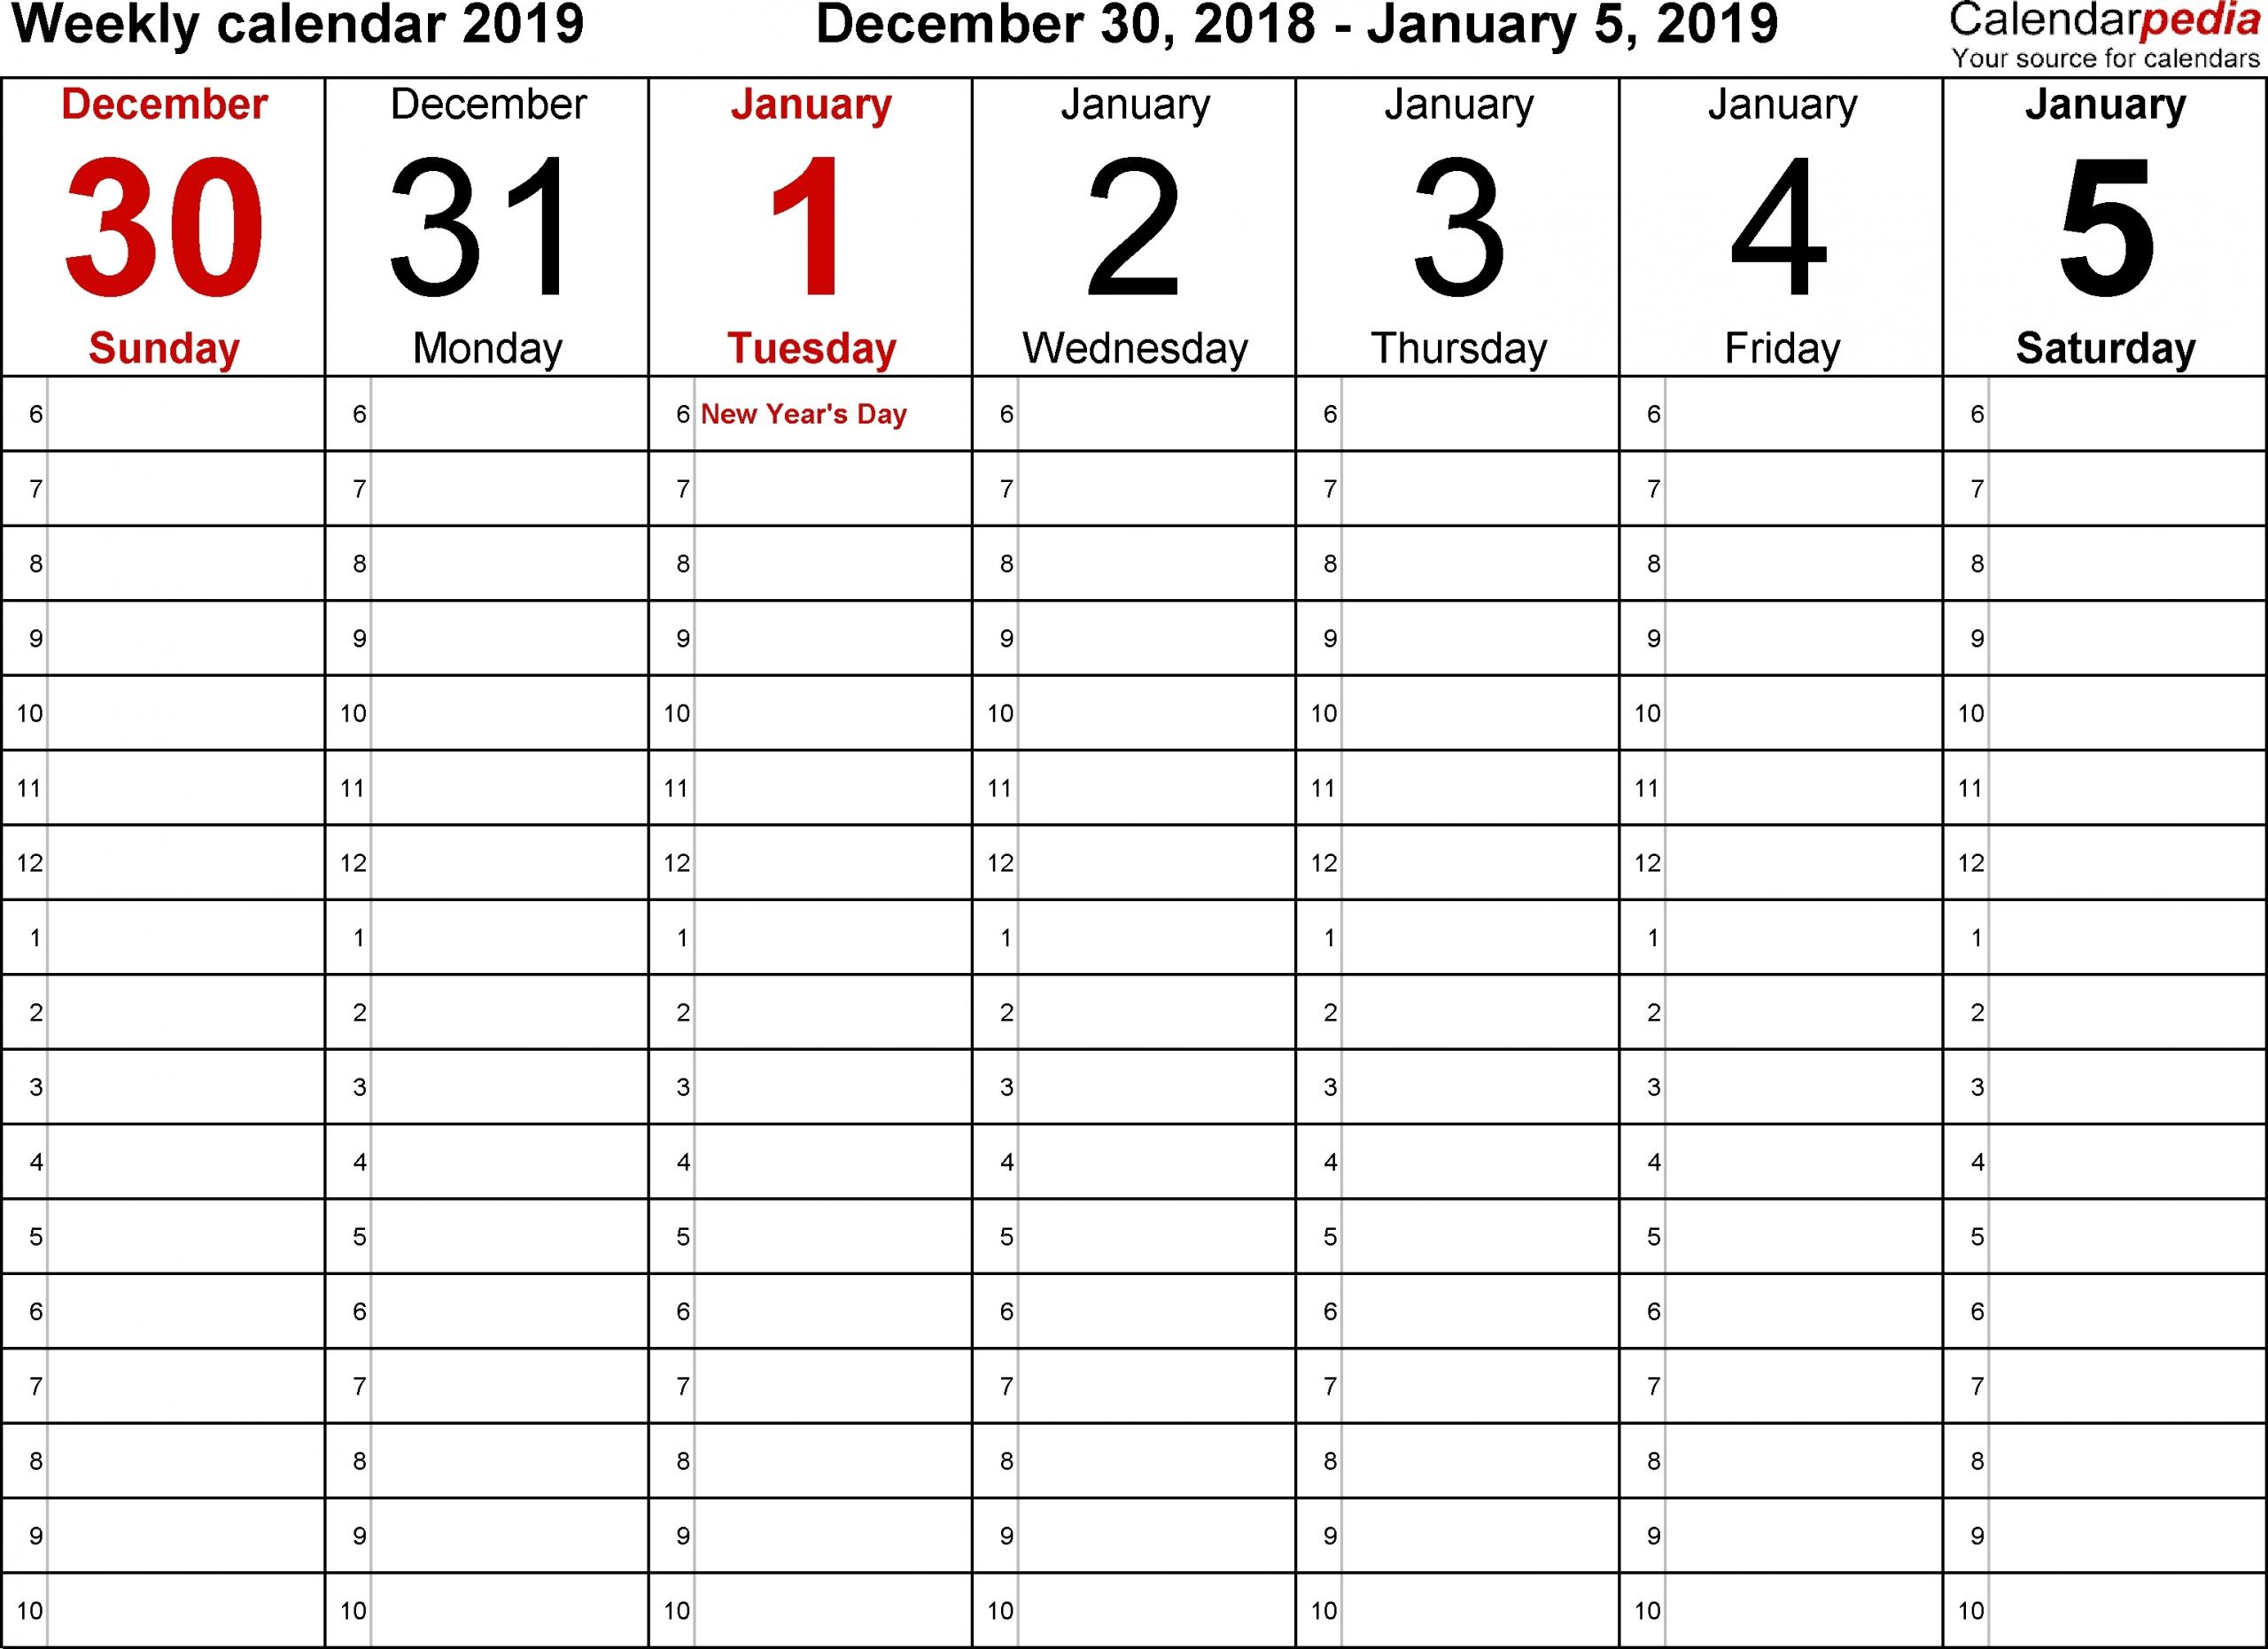 Blank Lined Weekly Printable Calendar - Calendar Inspiration Design